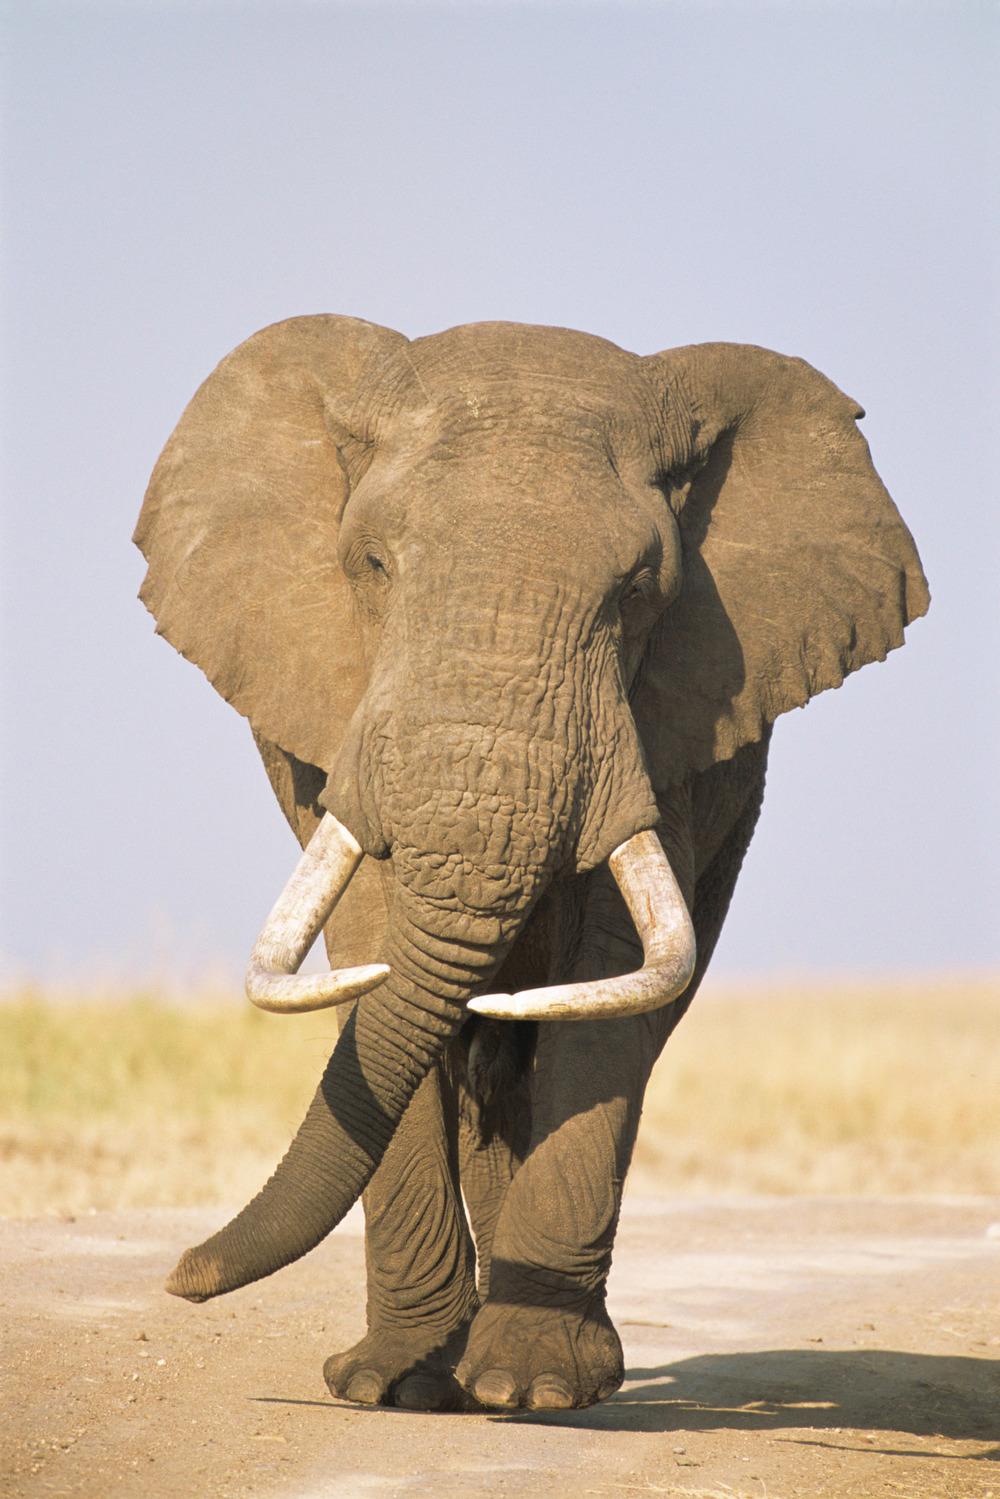 African bull elephant approaching, Masai Mara National Reserve, Kenya